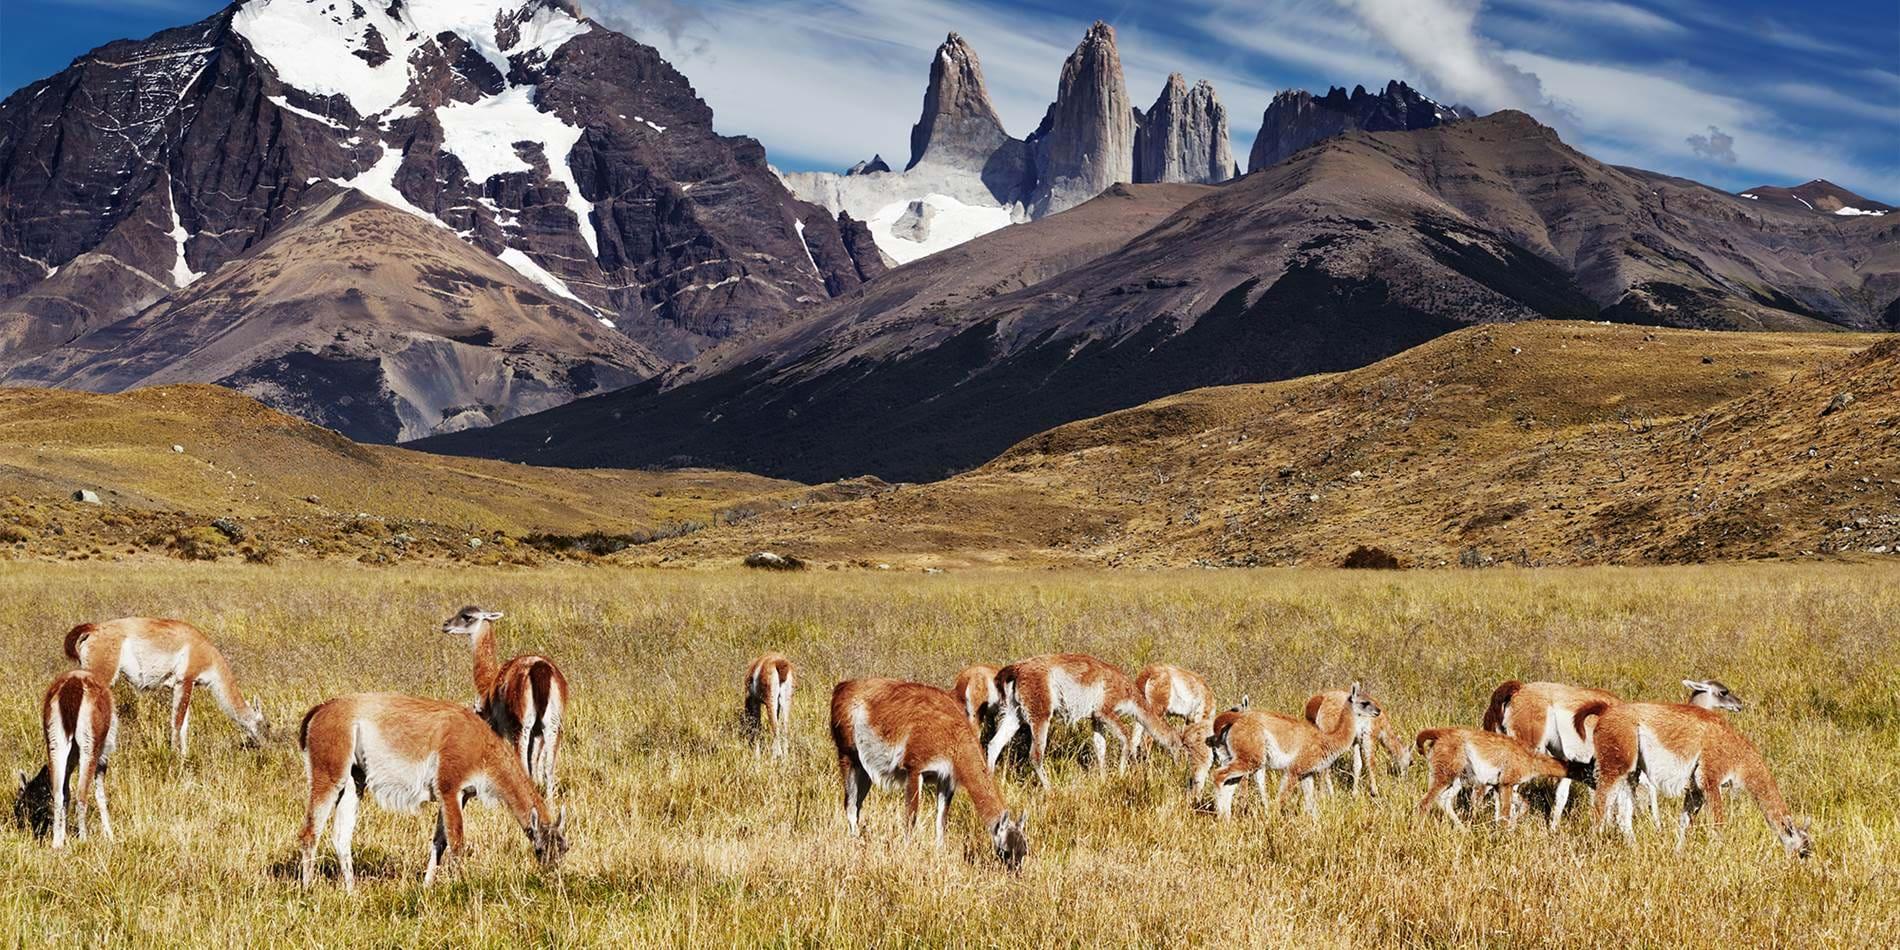 Hangmat Zuid Amerika.5 Plekken Die Je Gezien Moet Hebben In Zuid Amerika Kilroy